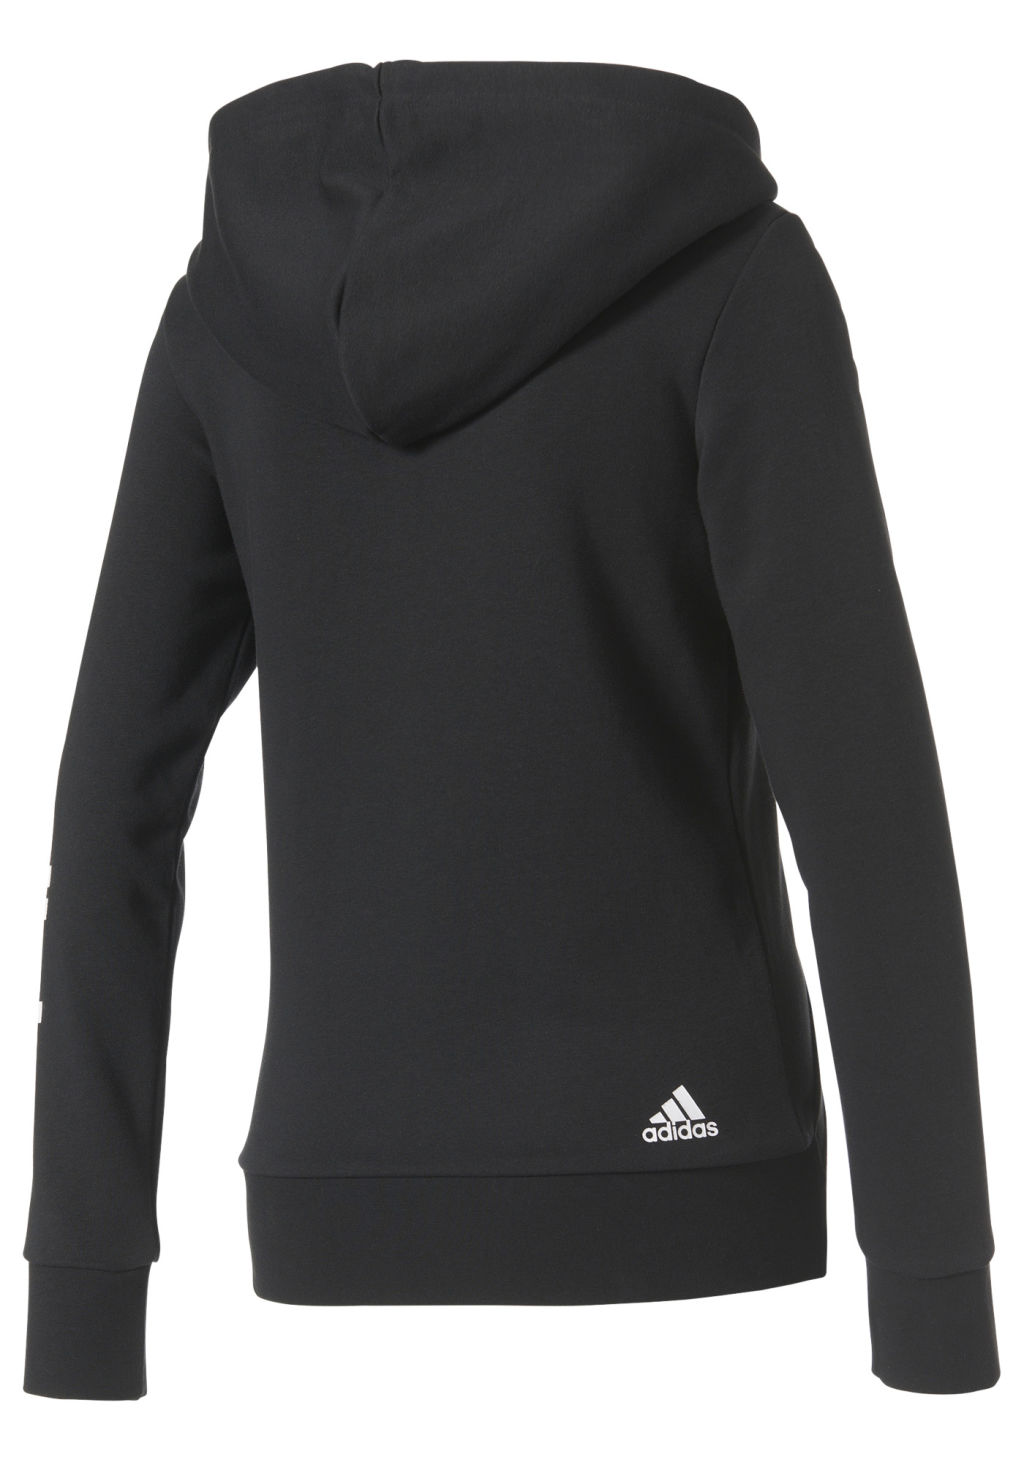 Adidas Ess Lin Fz naisten huppari Musta b91e063eca